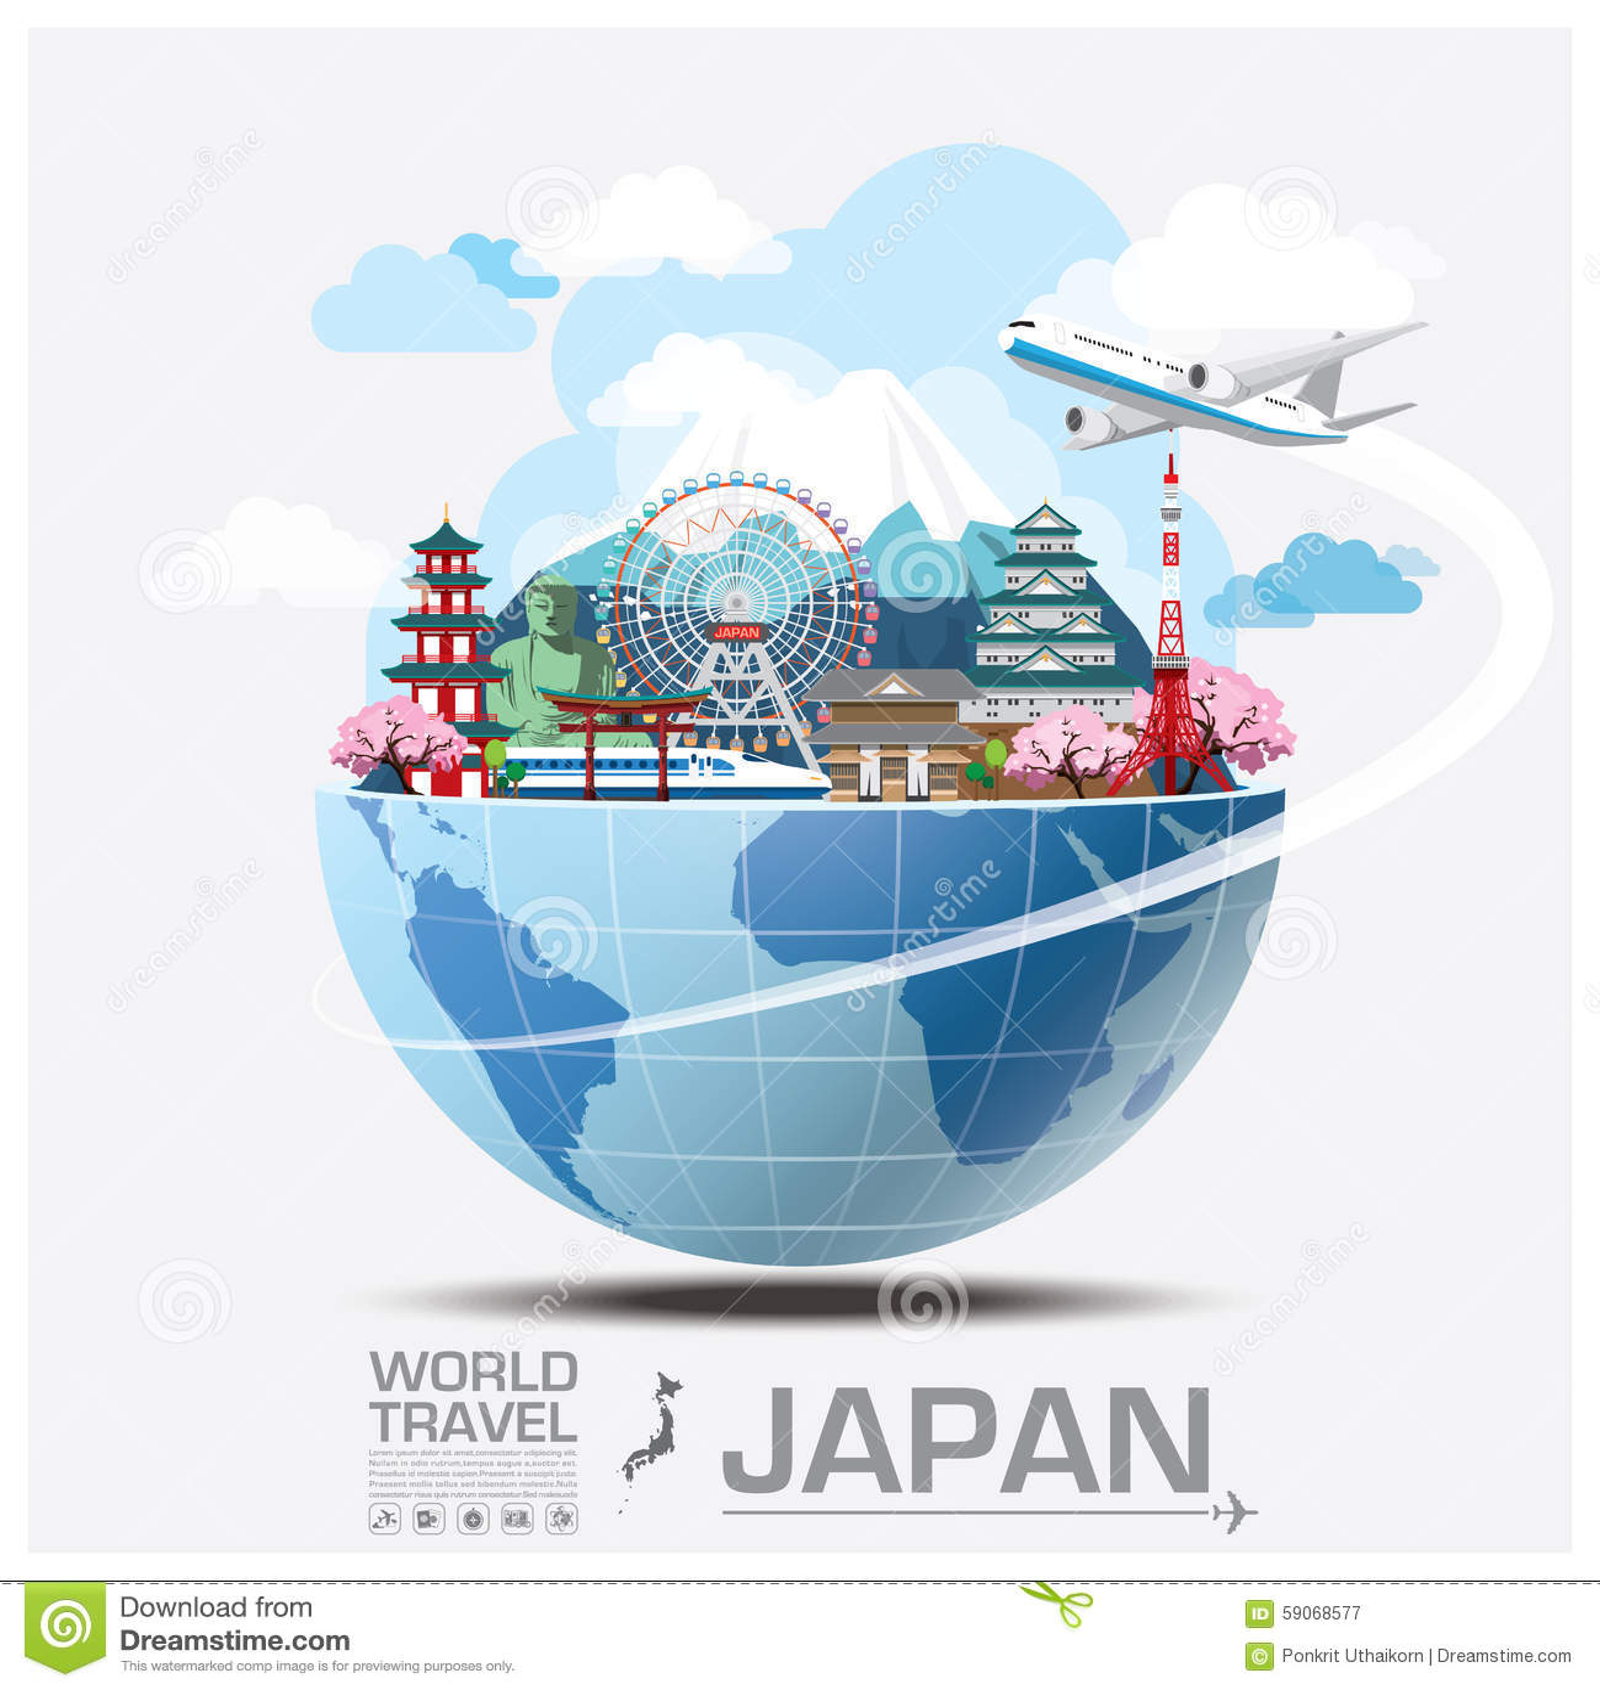 japan travel brochure template - japan landmark global travel and journey infographic stock